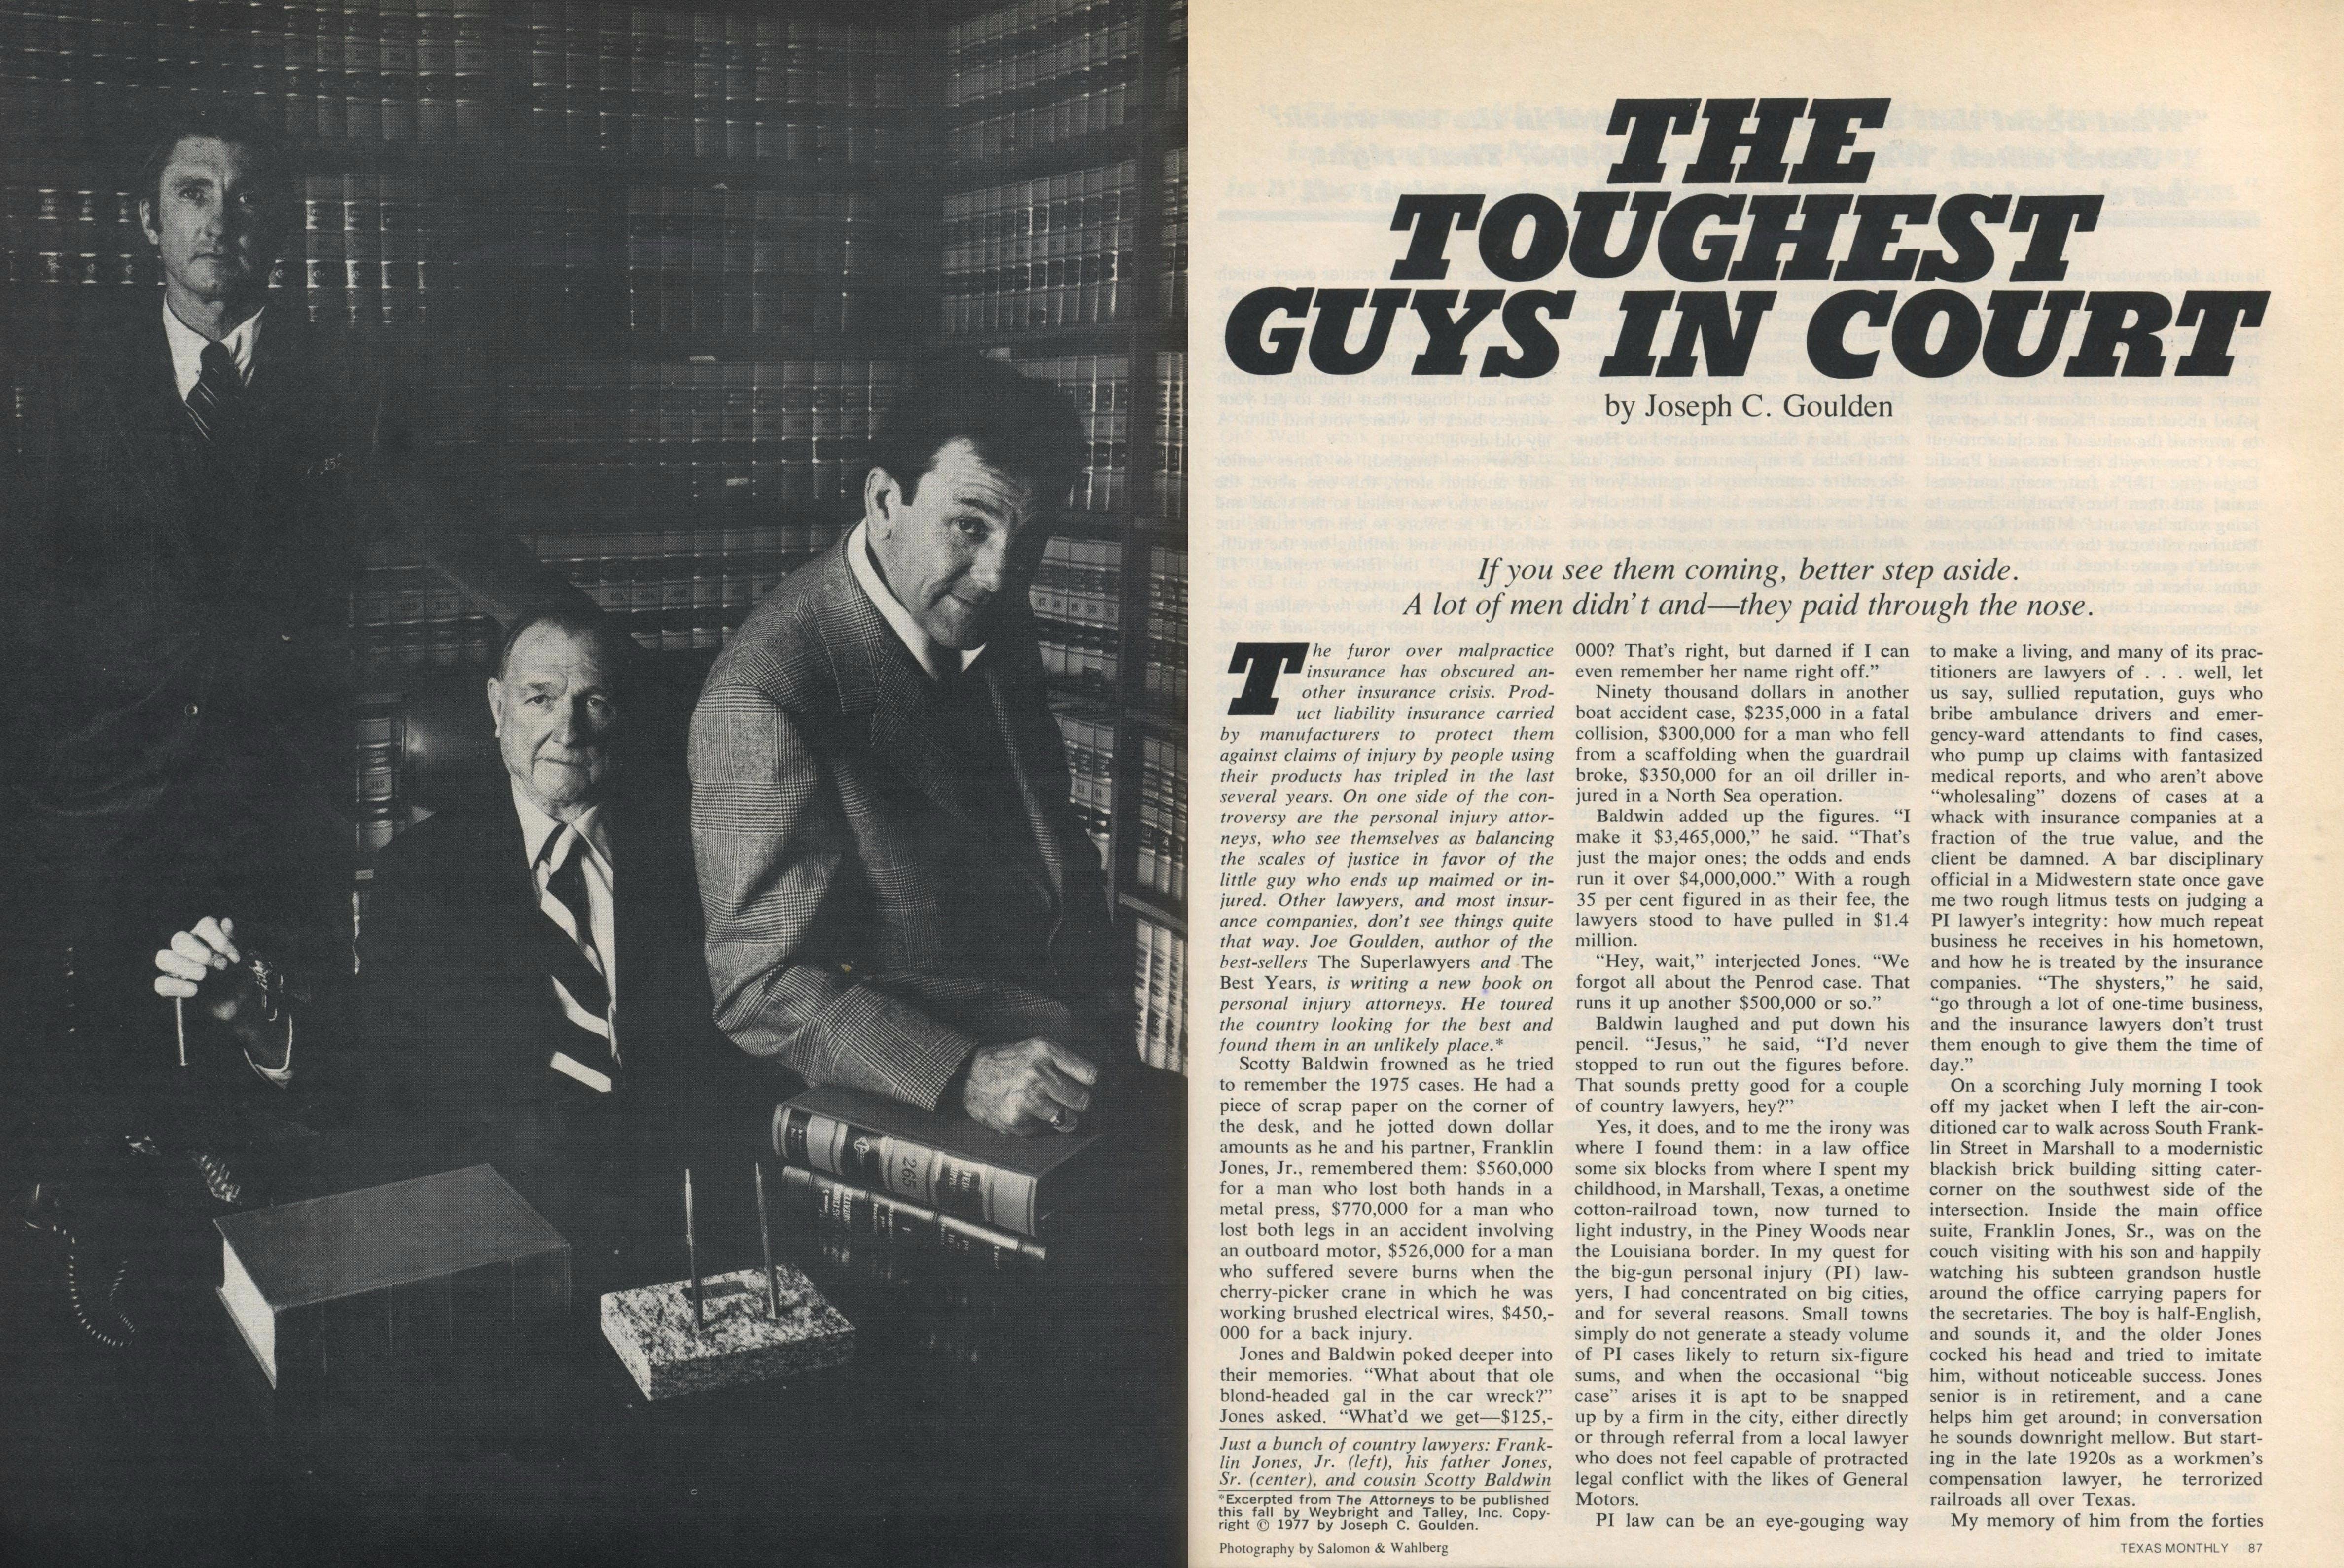 Toughest Guys in Court